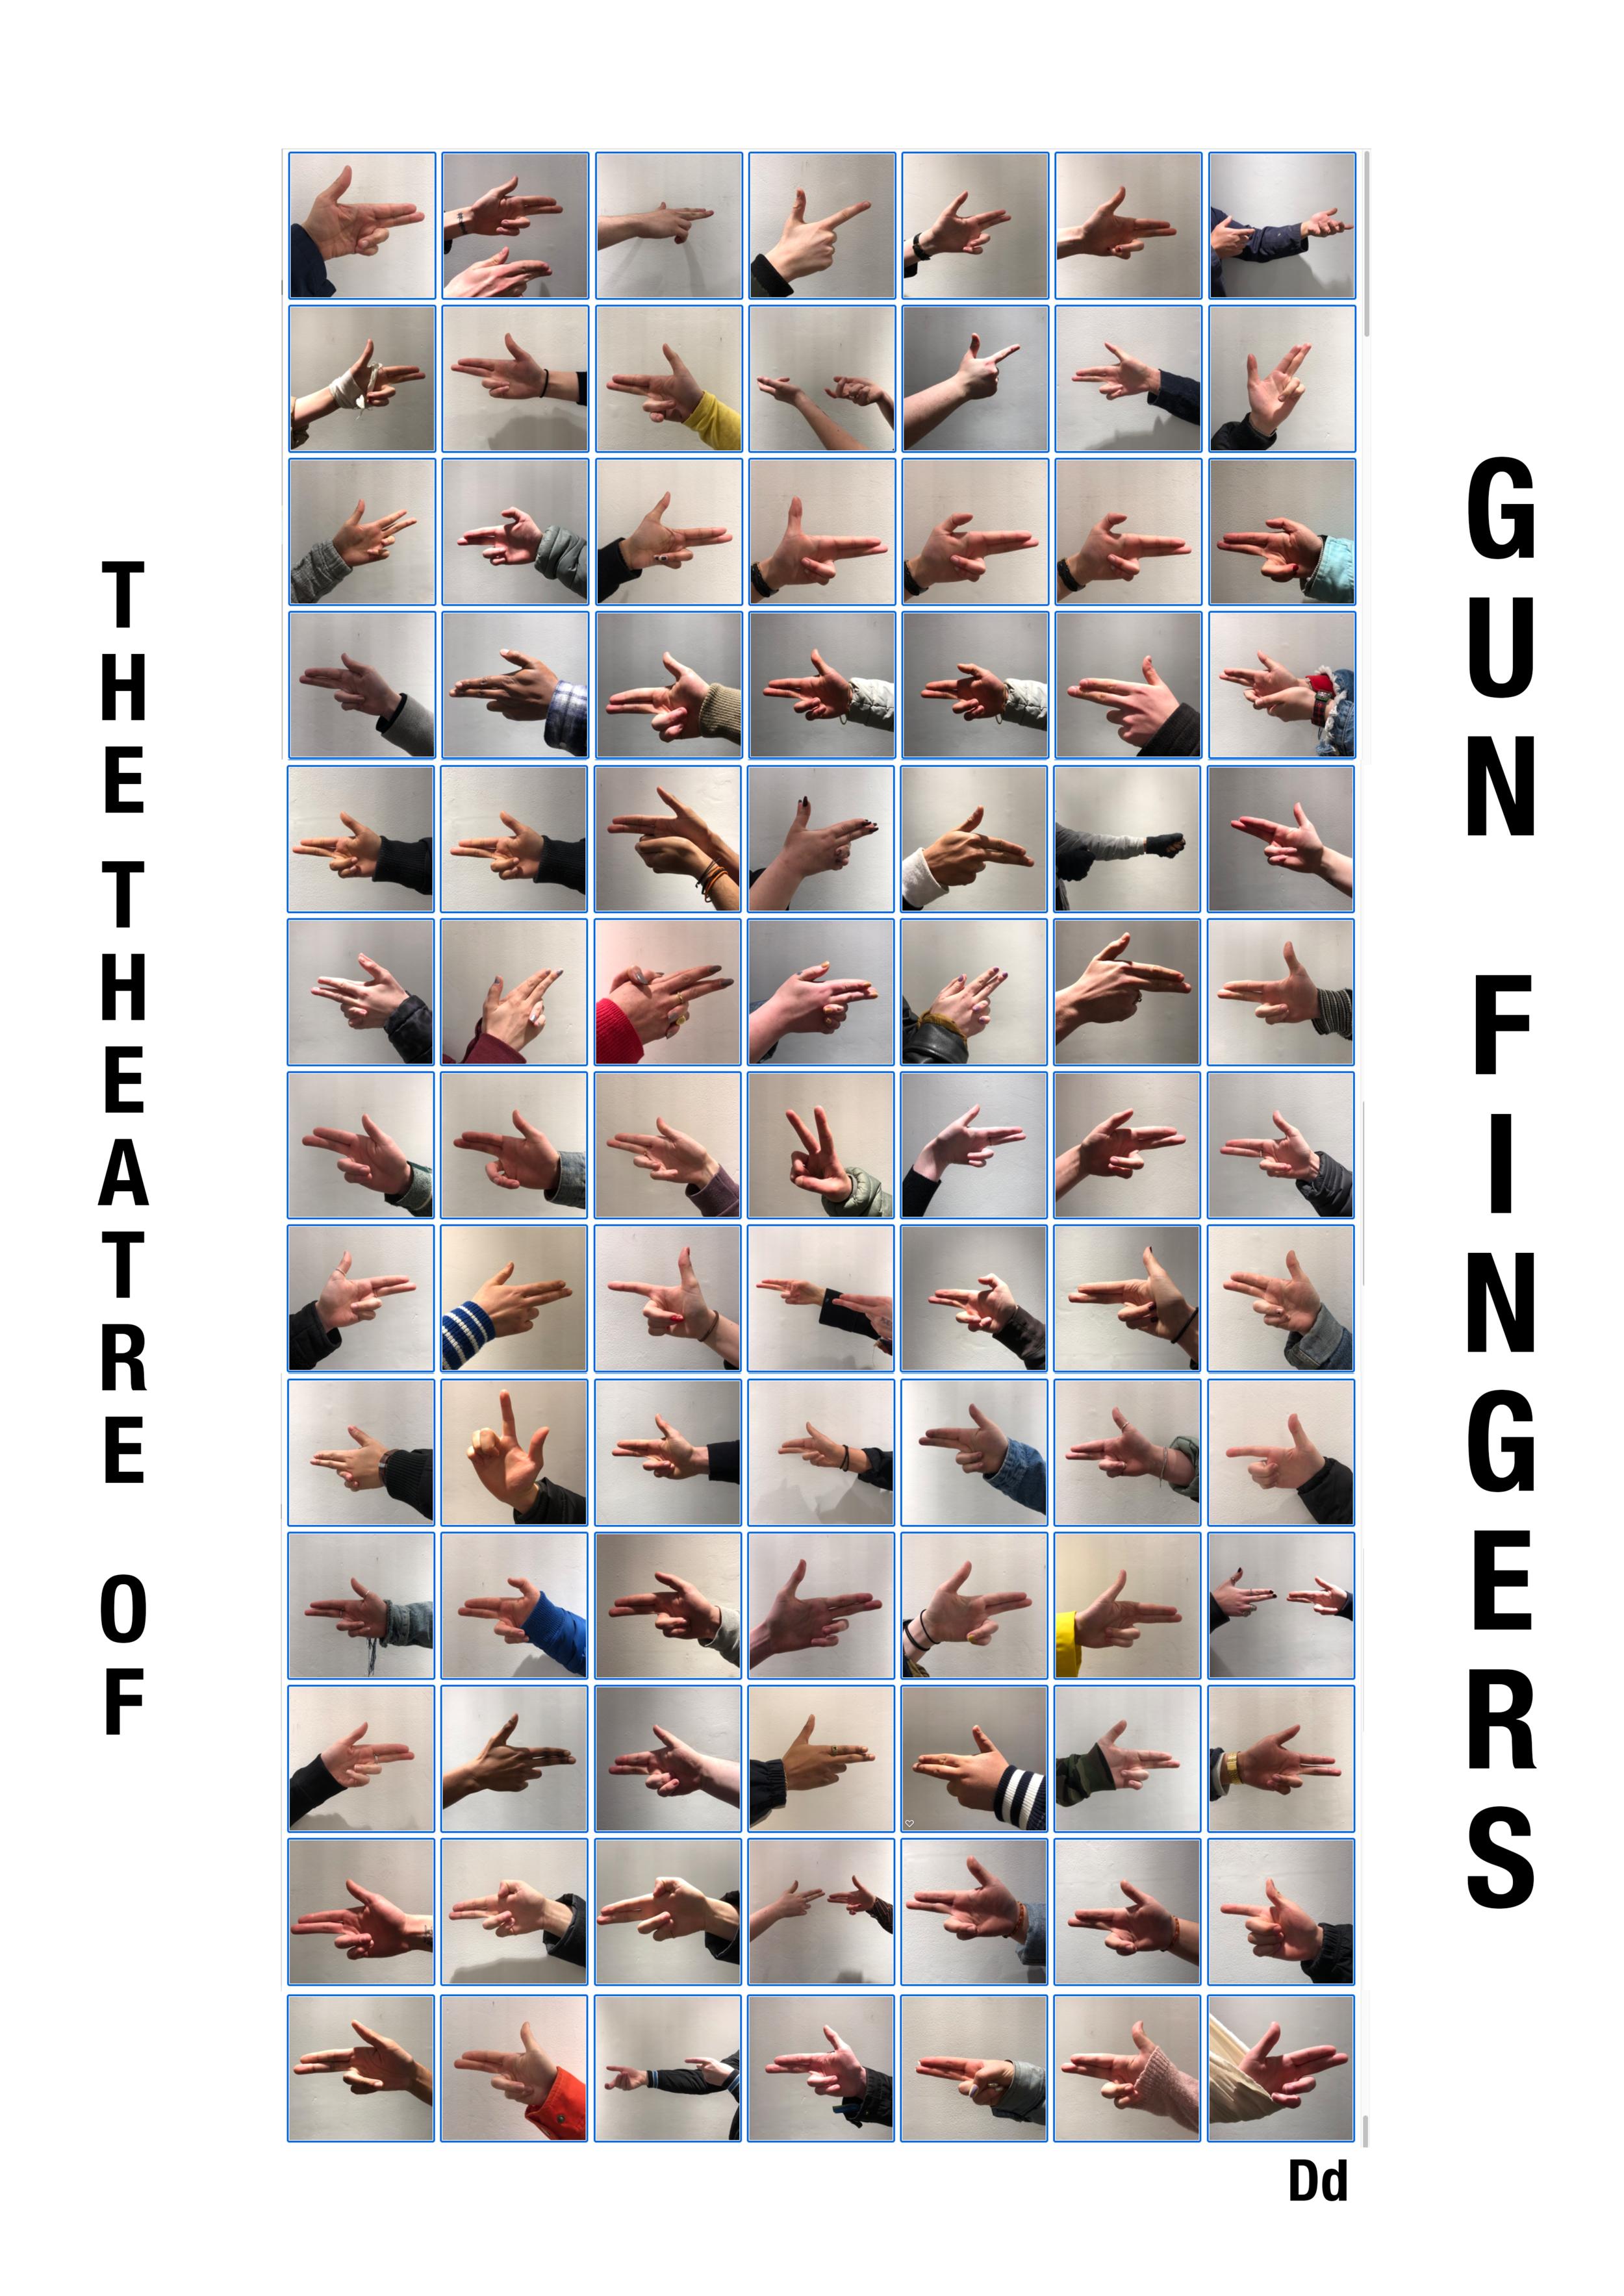 GunFingersCollage.png